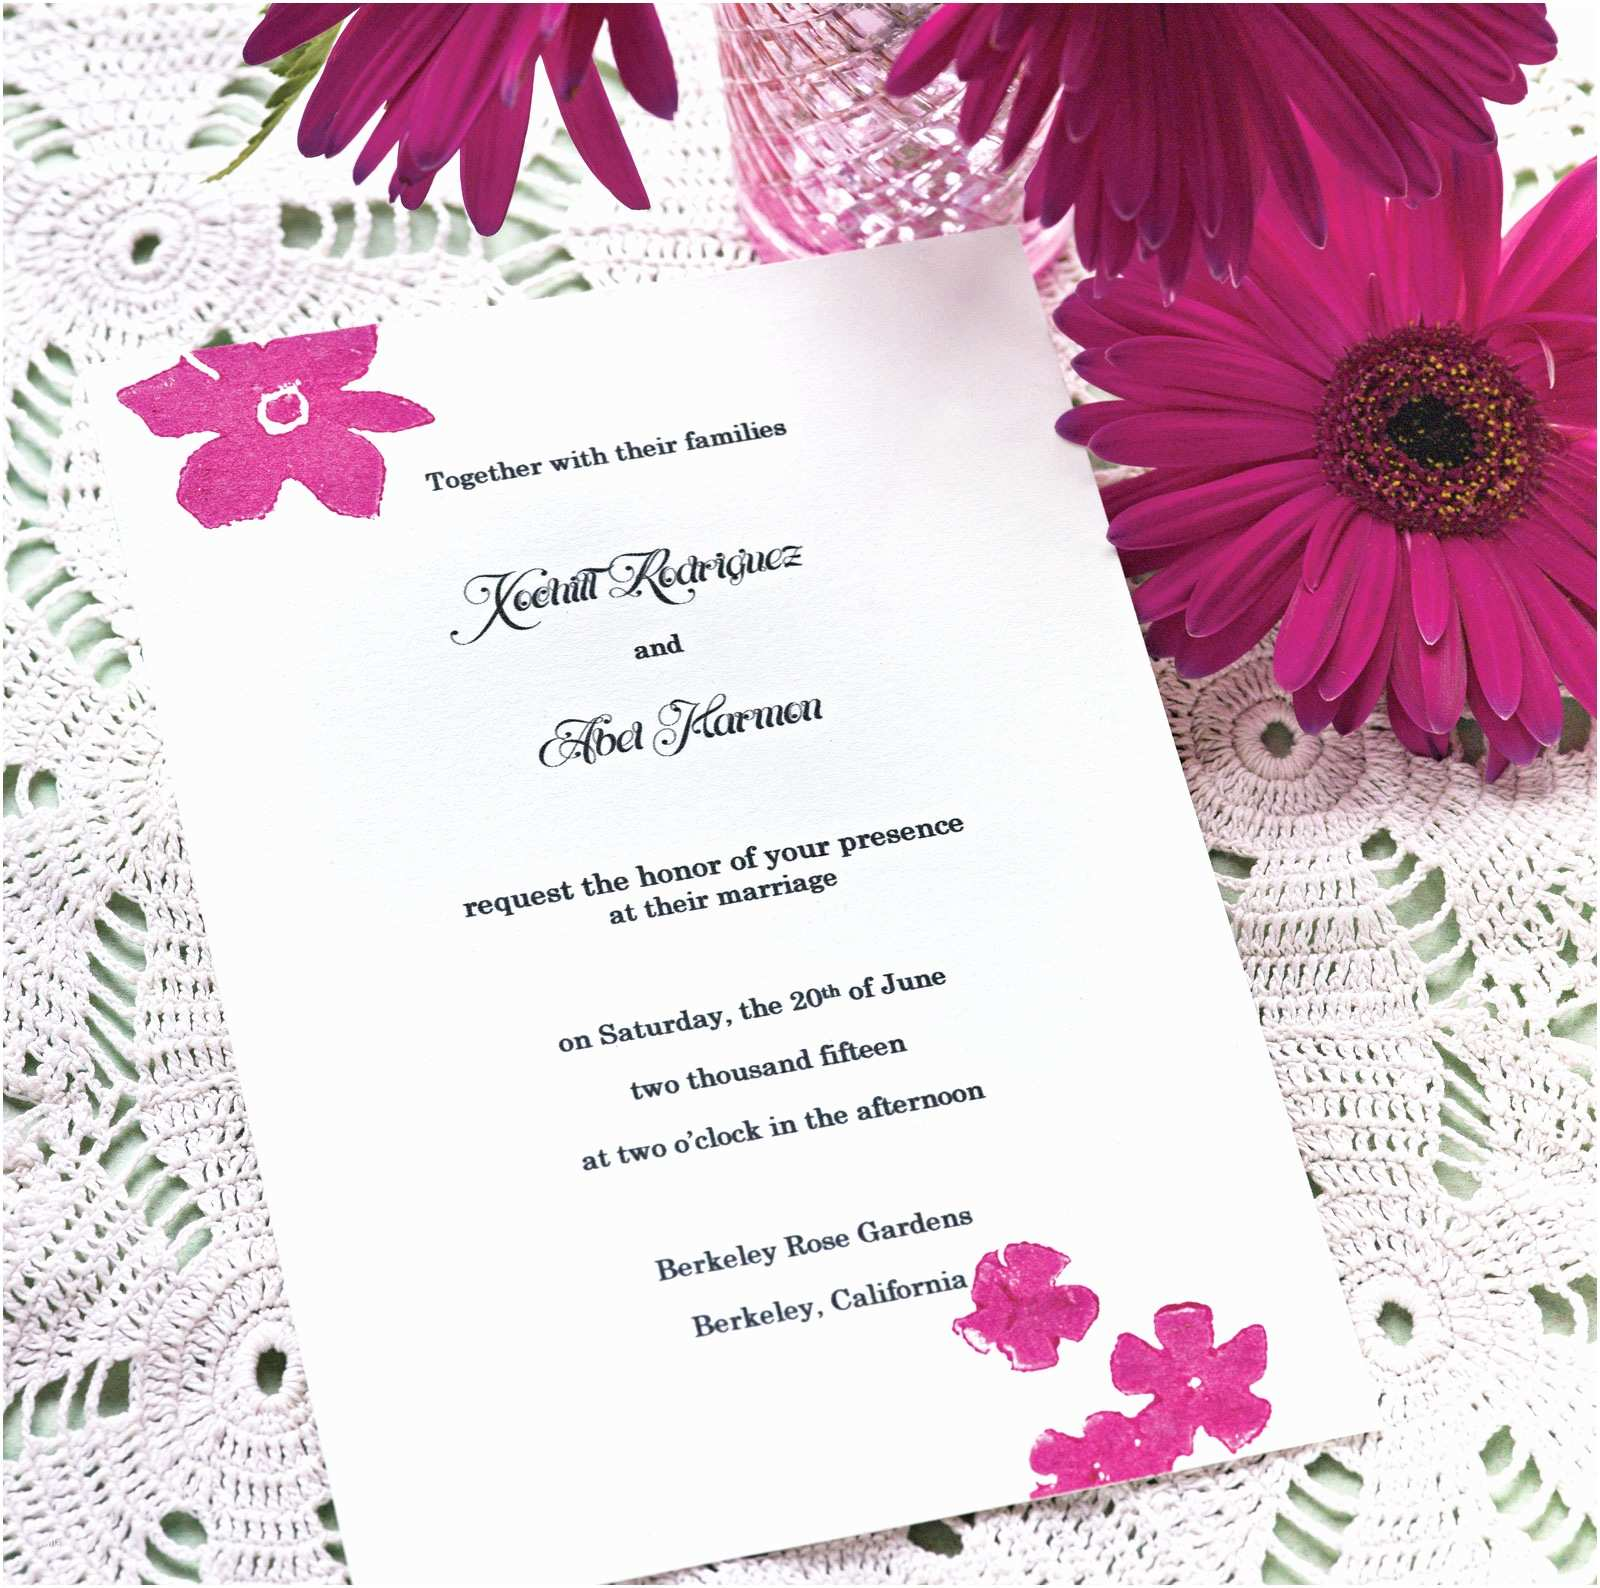 Wedding Invitation Content Simple Wedding Invitation Card Design